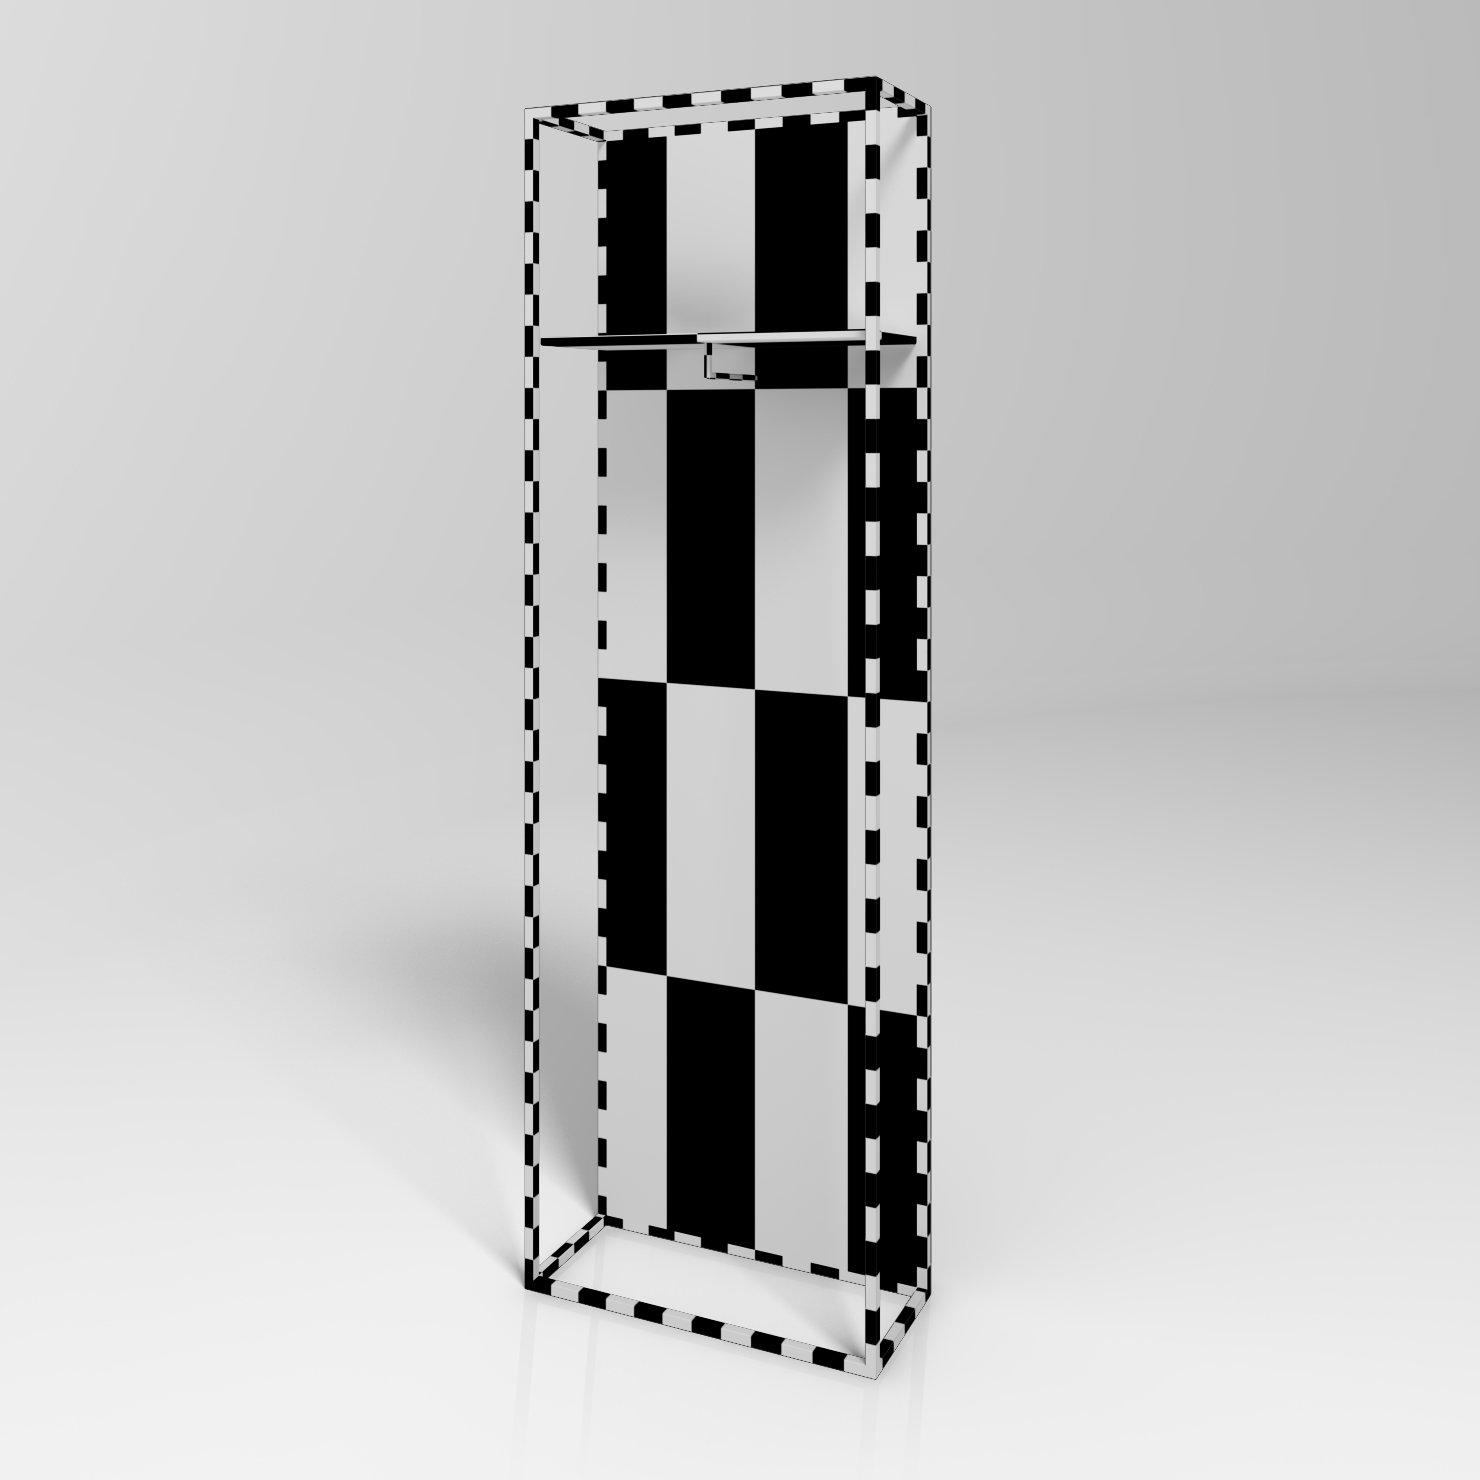 bettelux shape mirror 3d-modell in badezimmer - 3dexport, Badezimmer ideen